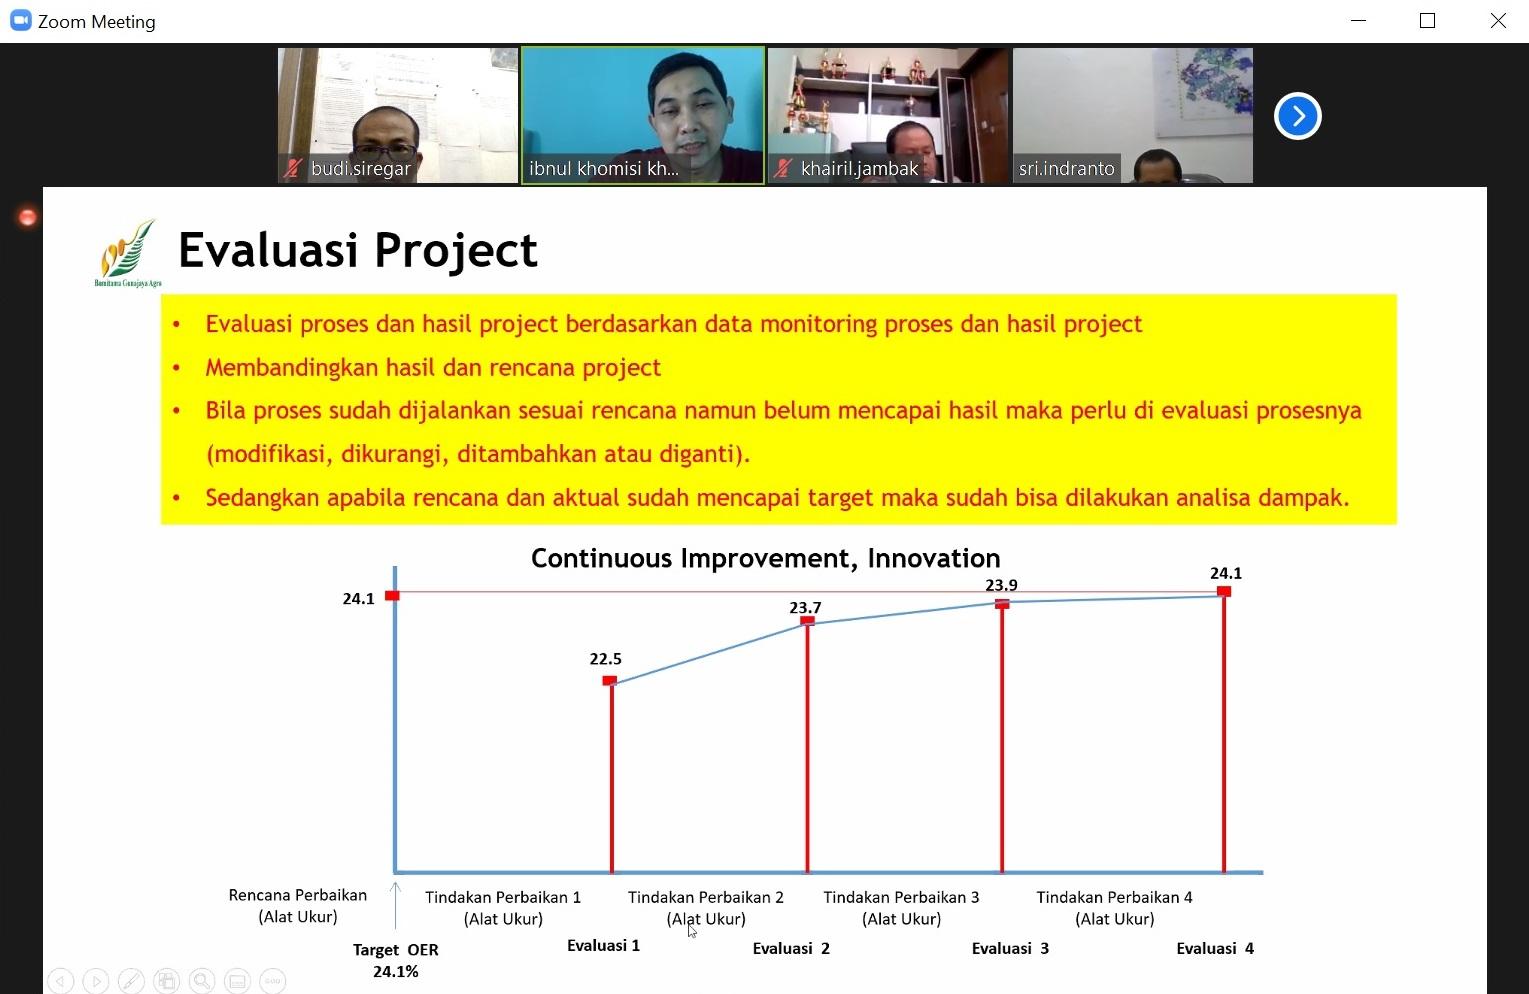 14. Evaluasi Project